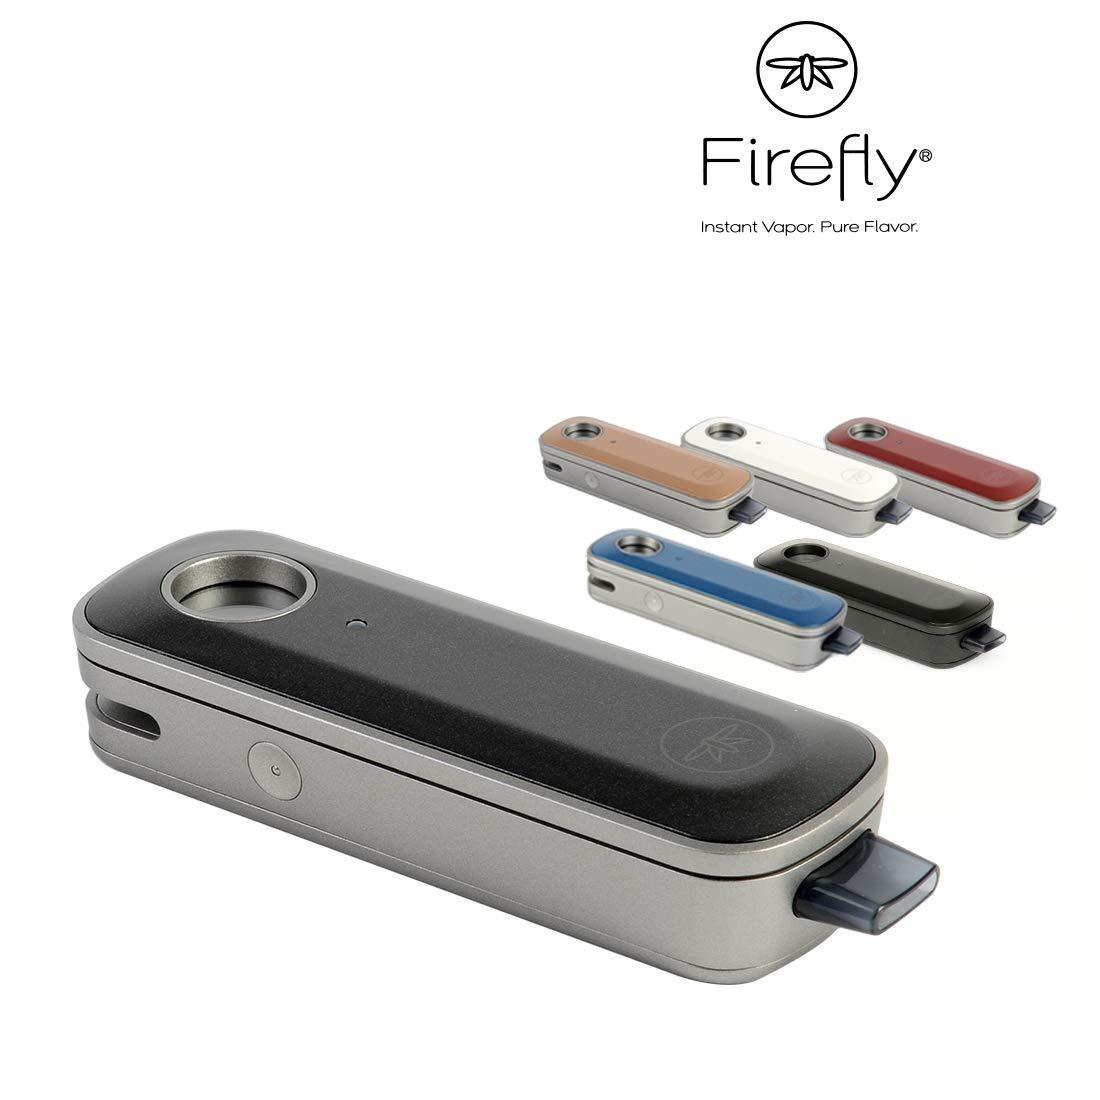 FireFly 2 Vaporizzatore portatile Bleu